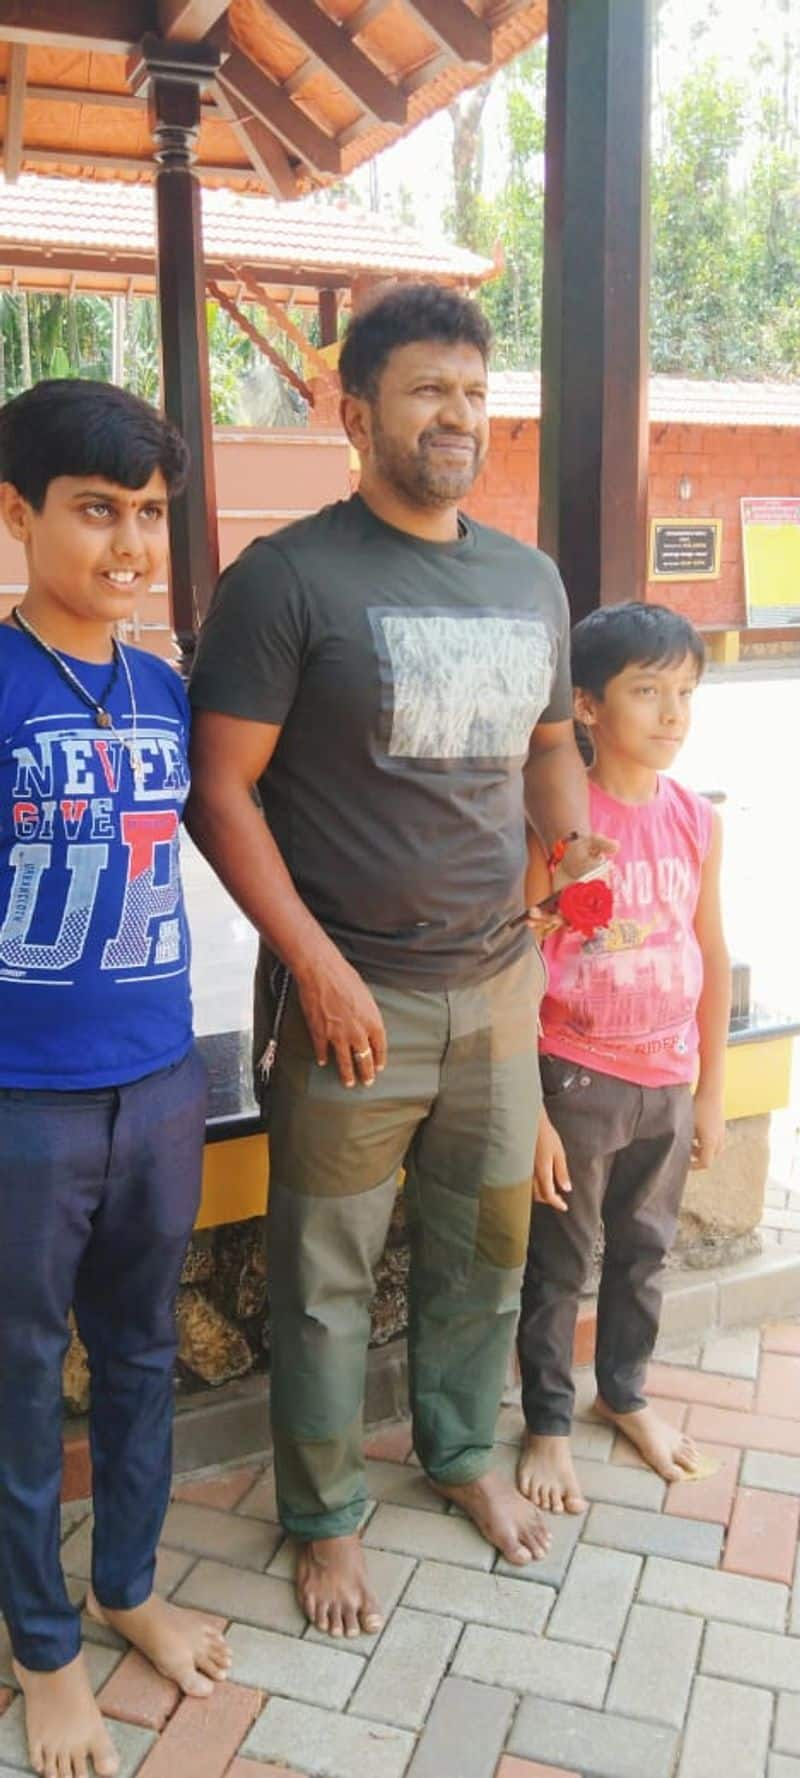 <p>46ನೇ ವಸಂತಕ್ಕೆ ಕಾಲಿಟ್ಟ ಪುನೀತ್ ರಾಜ್ಕುಮಾರ್.</p>